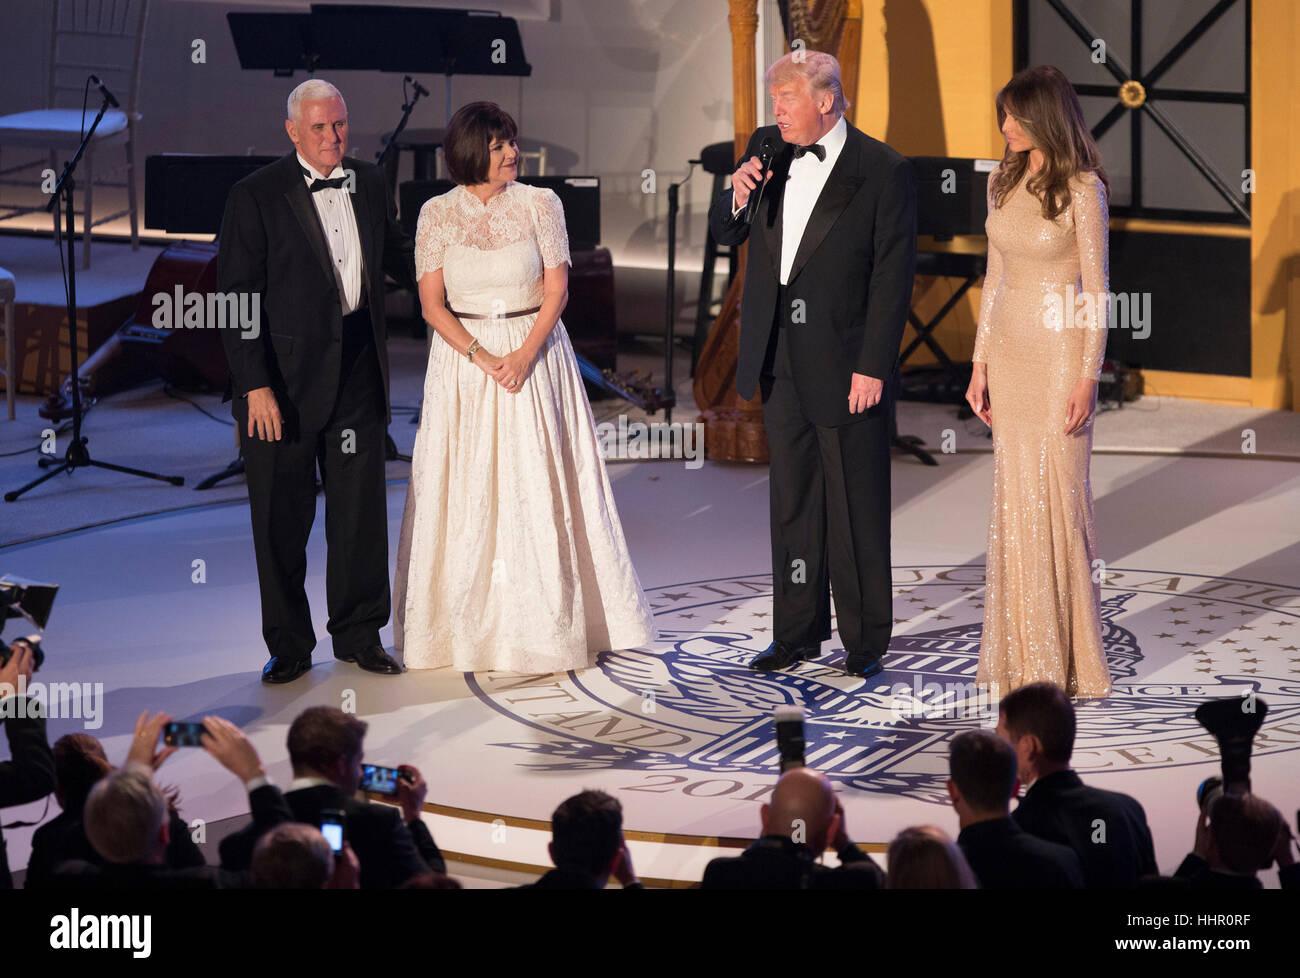 Washington, DC, USA. 19 Jan, 2017. -Vice-président élu des États-Unis Mike Pence, sa femme Karen Photo Stock